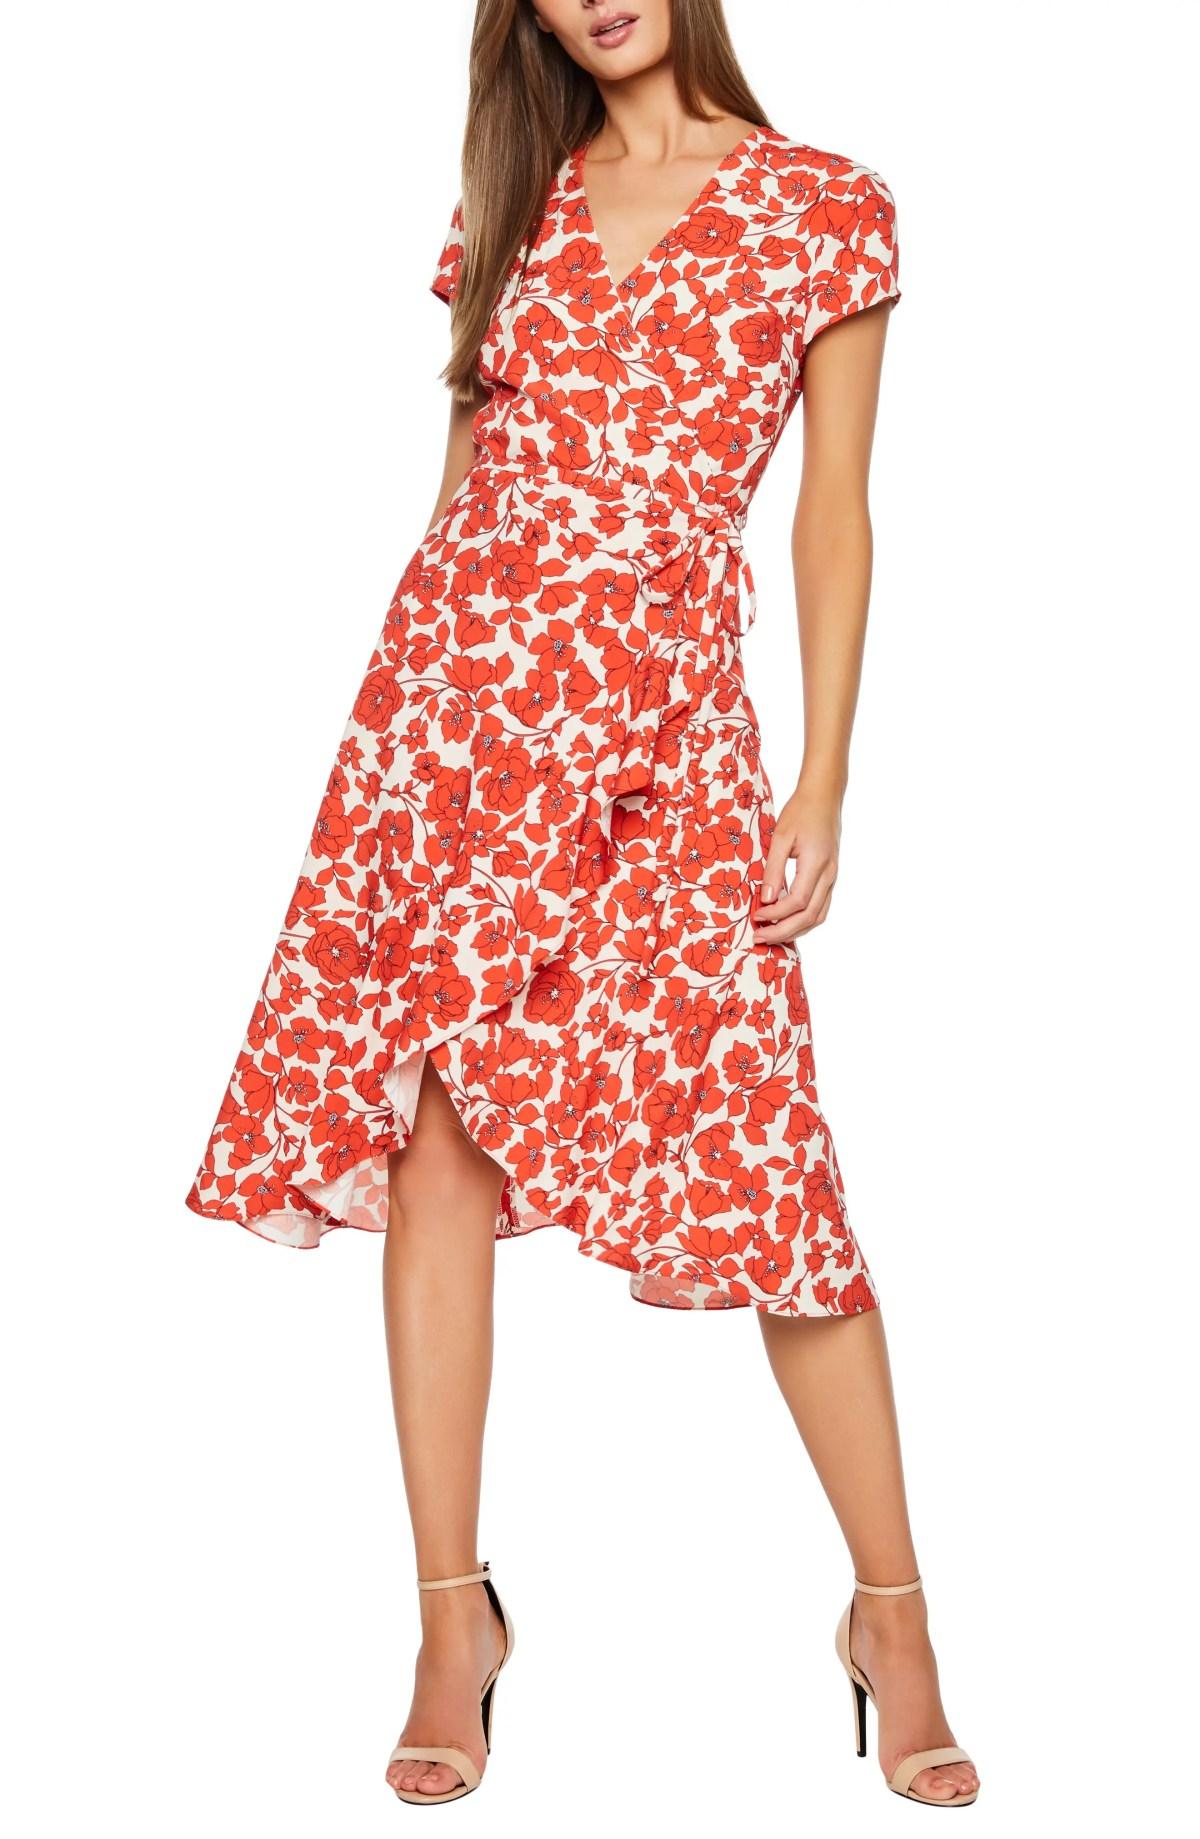 BARDOT Fiesta Floral Midi Dress, Main, color, ORANGE FLORAL